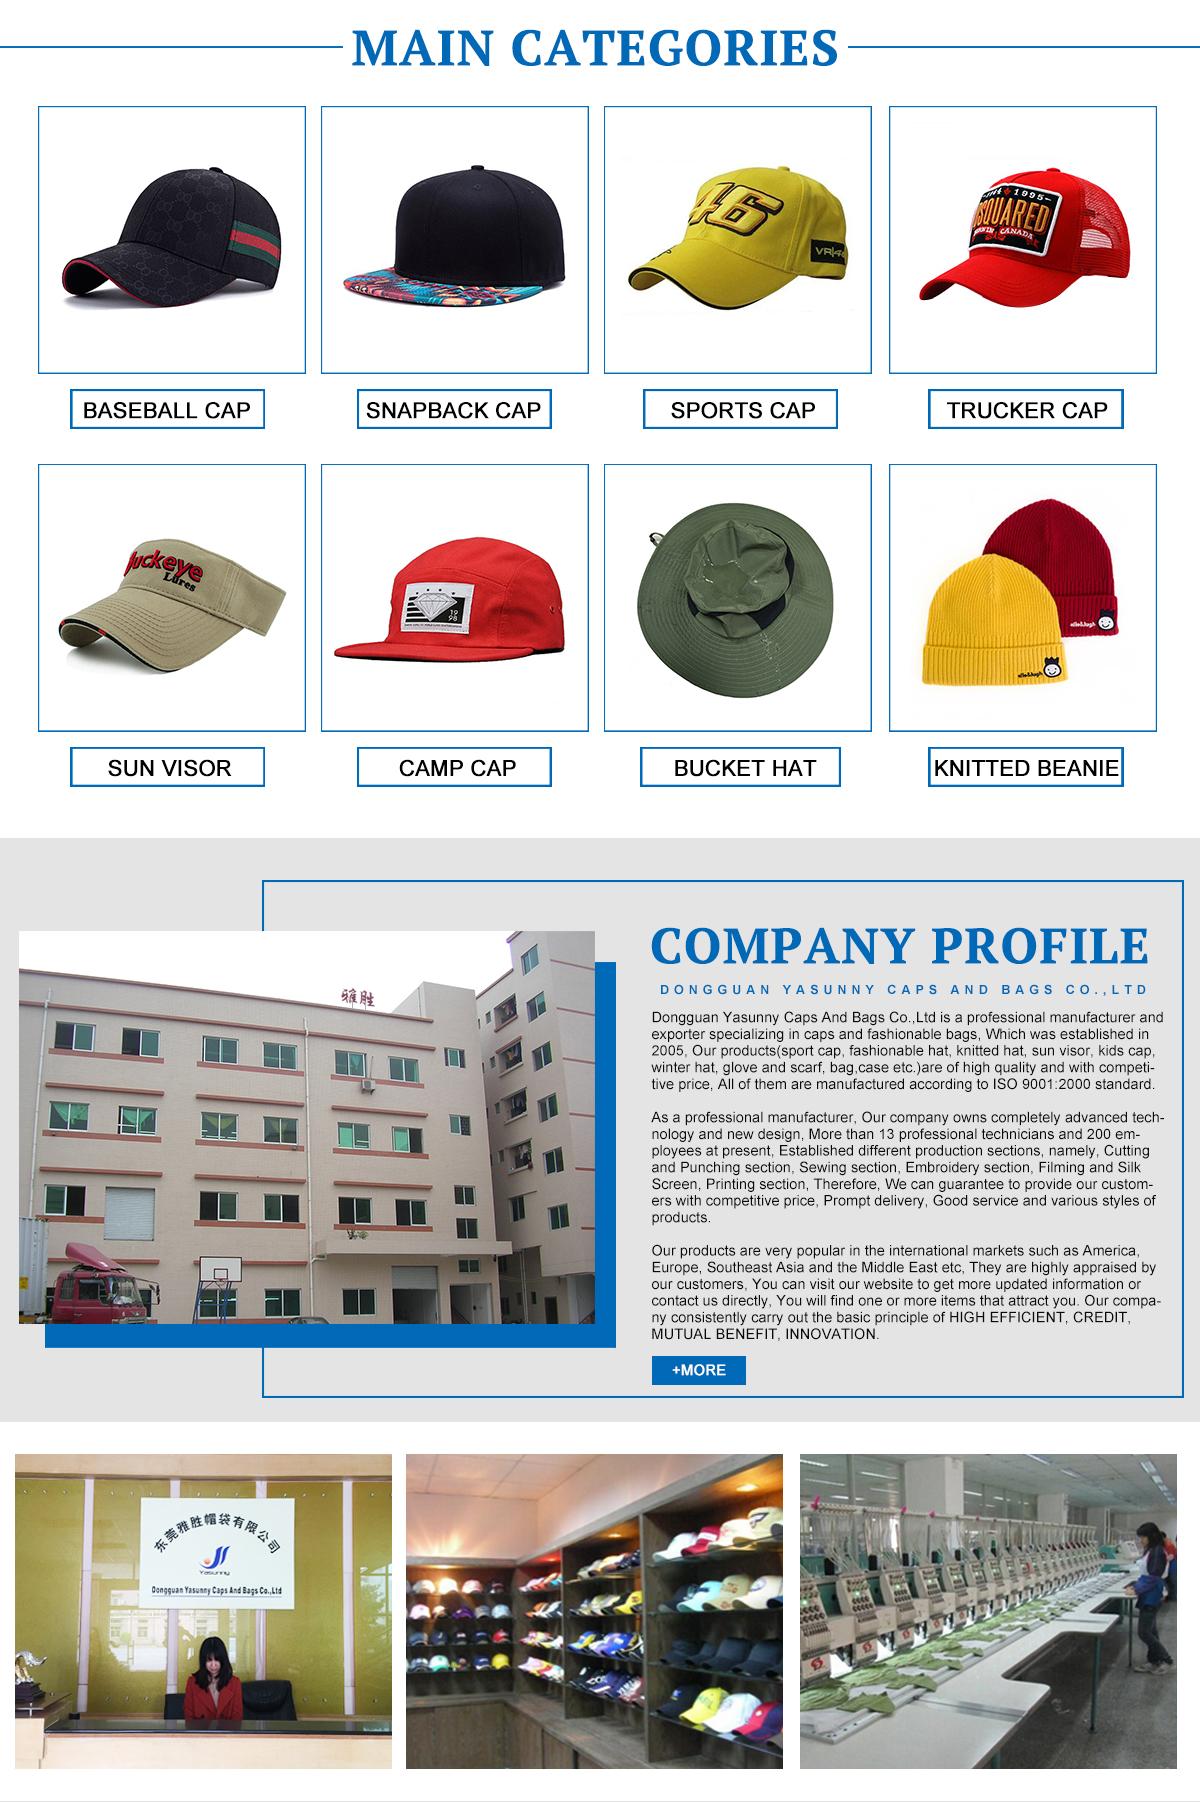 e8f211348fbec Dongguan Yasunny Caps And Bags Co.